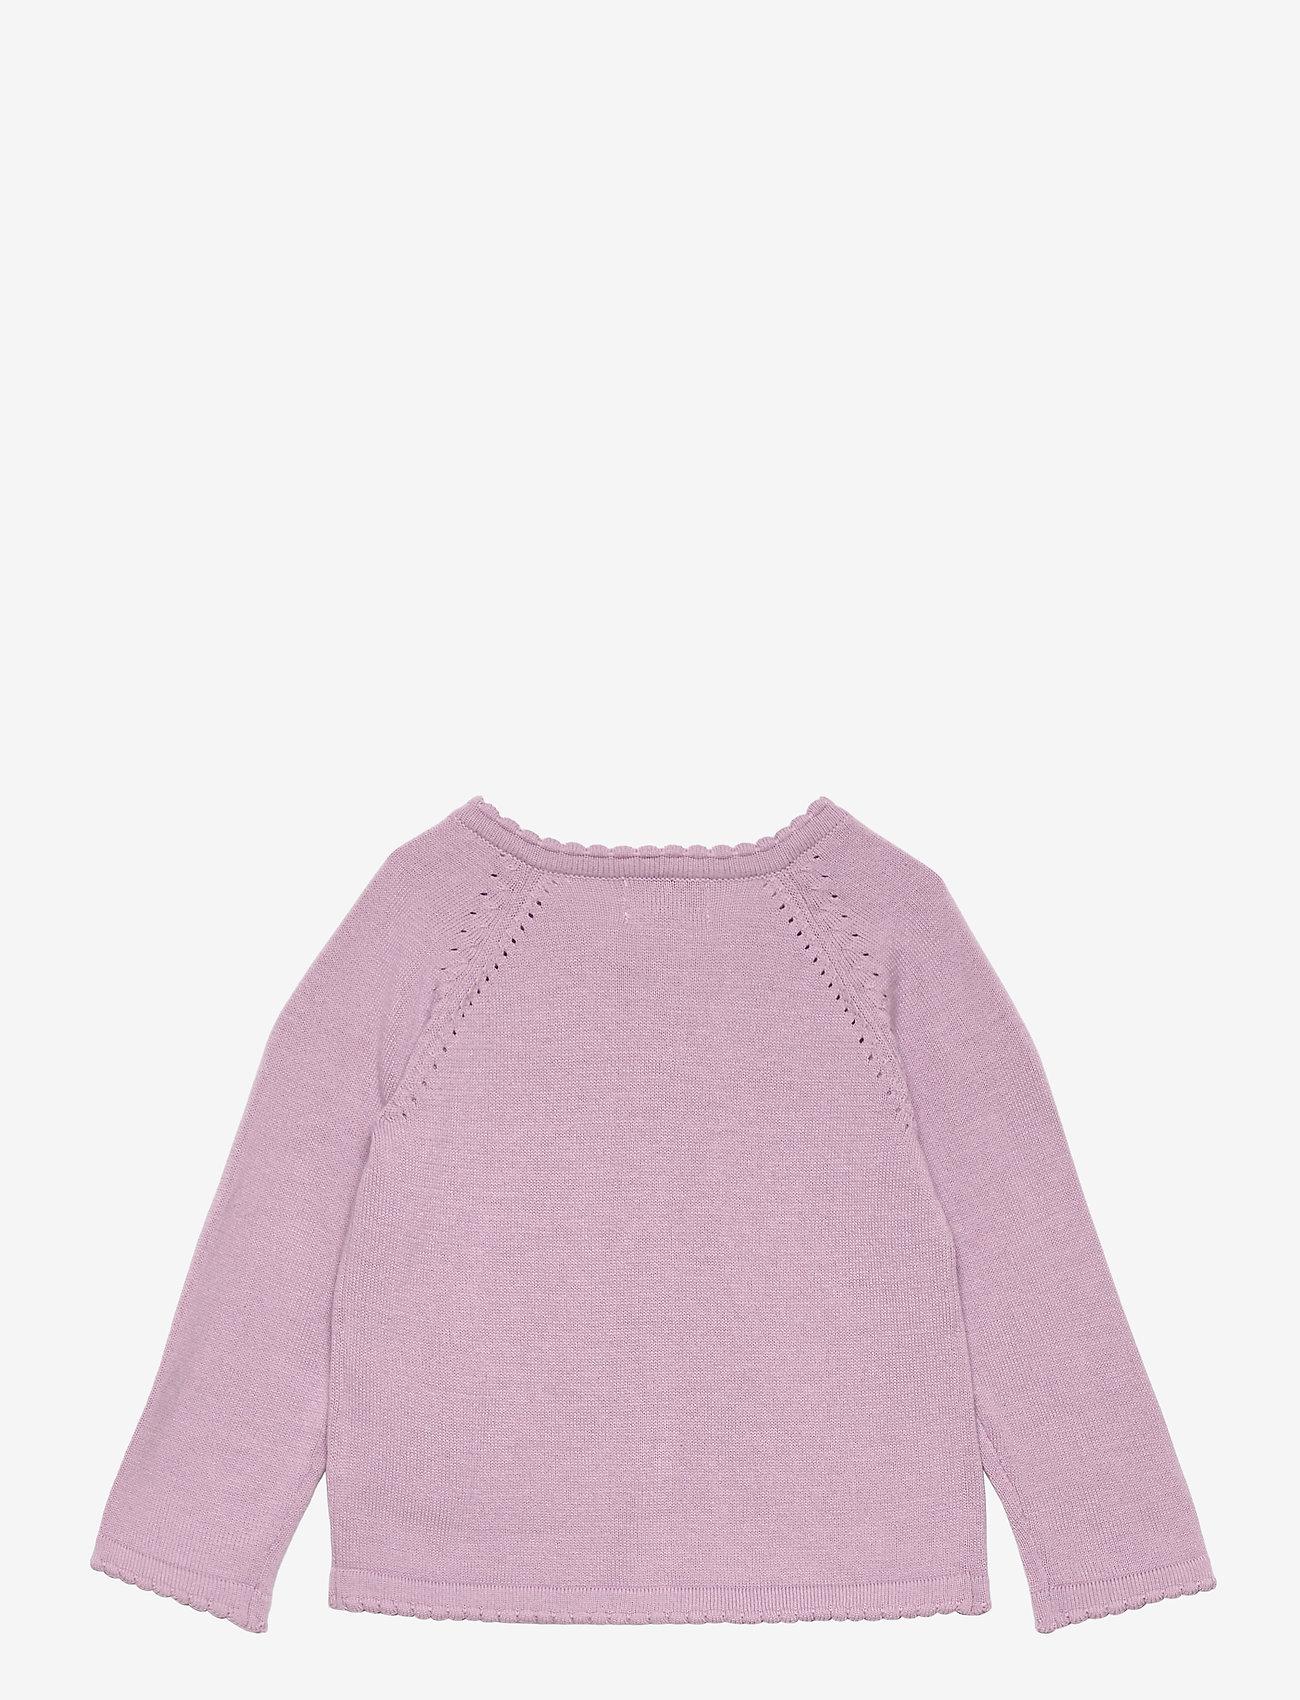 Noa Noa Miniature - Cardigan - gilets - lavender frost - 1